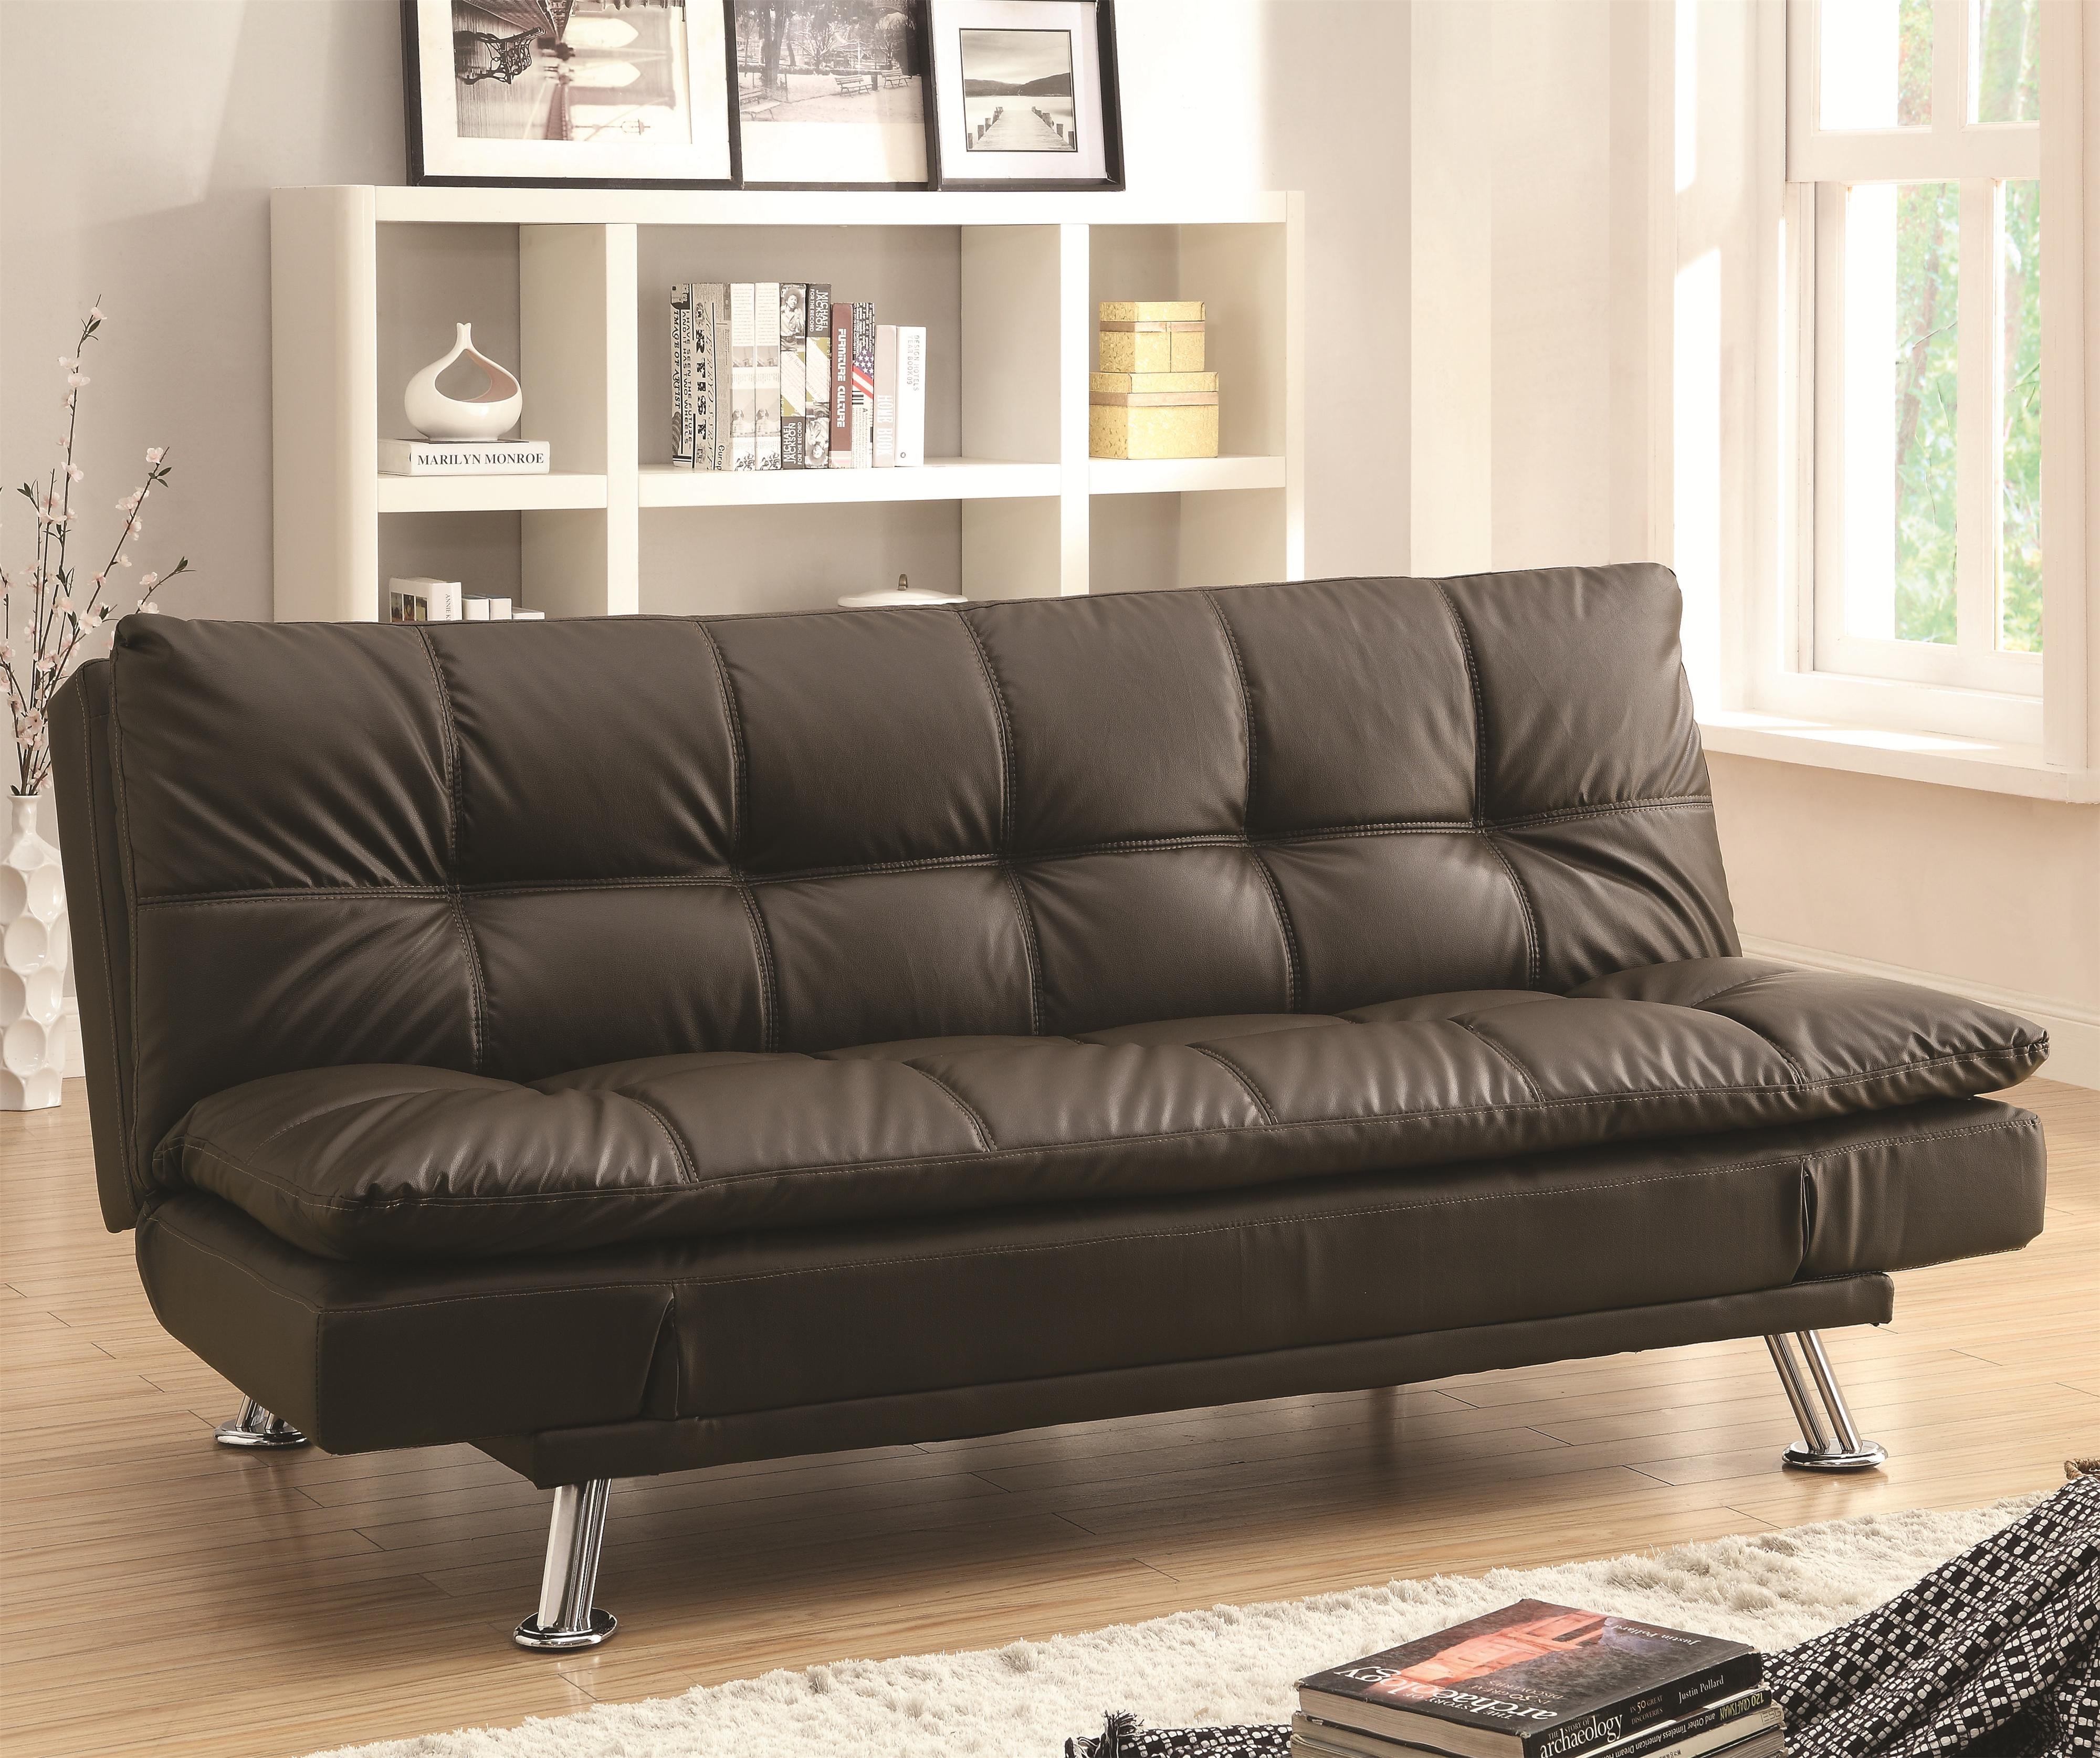 sofa bed futon style di bandung coaster dilleston 300321 in with